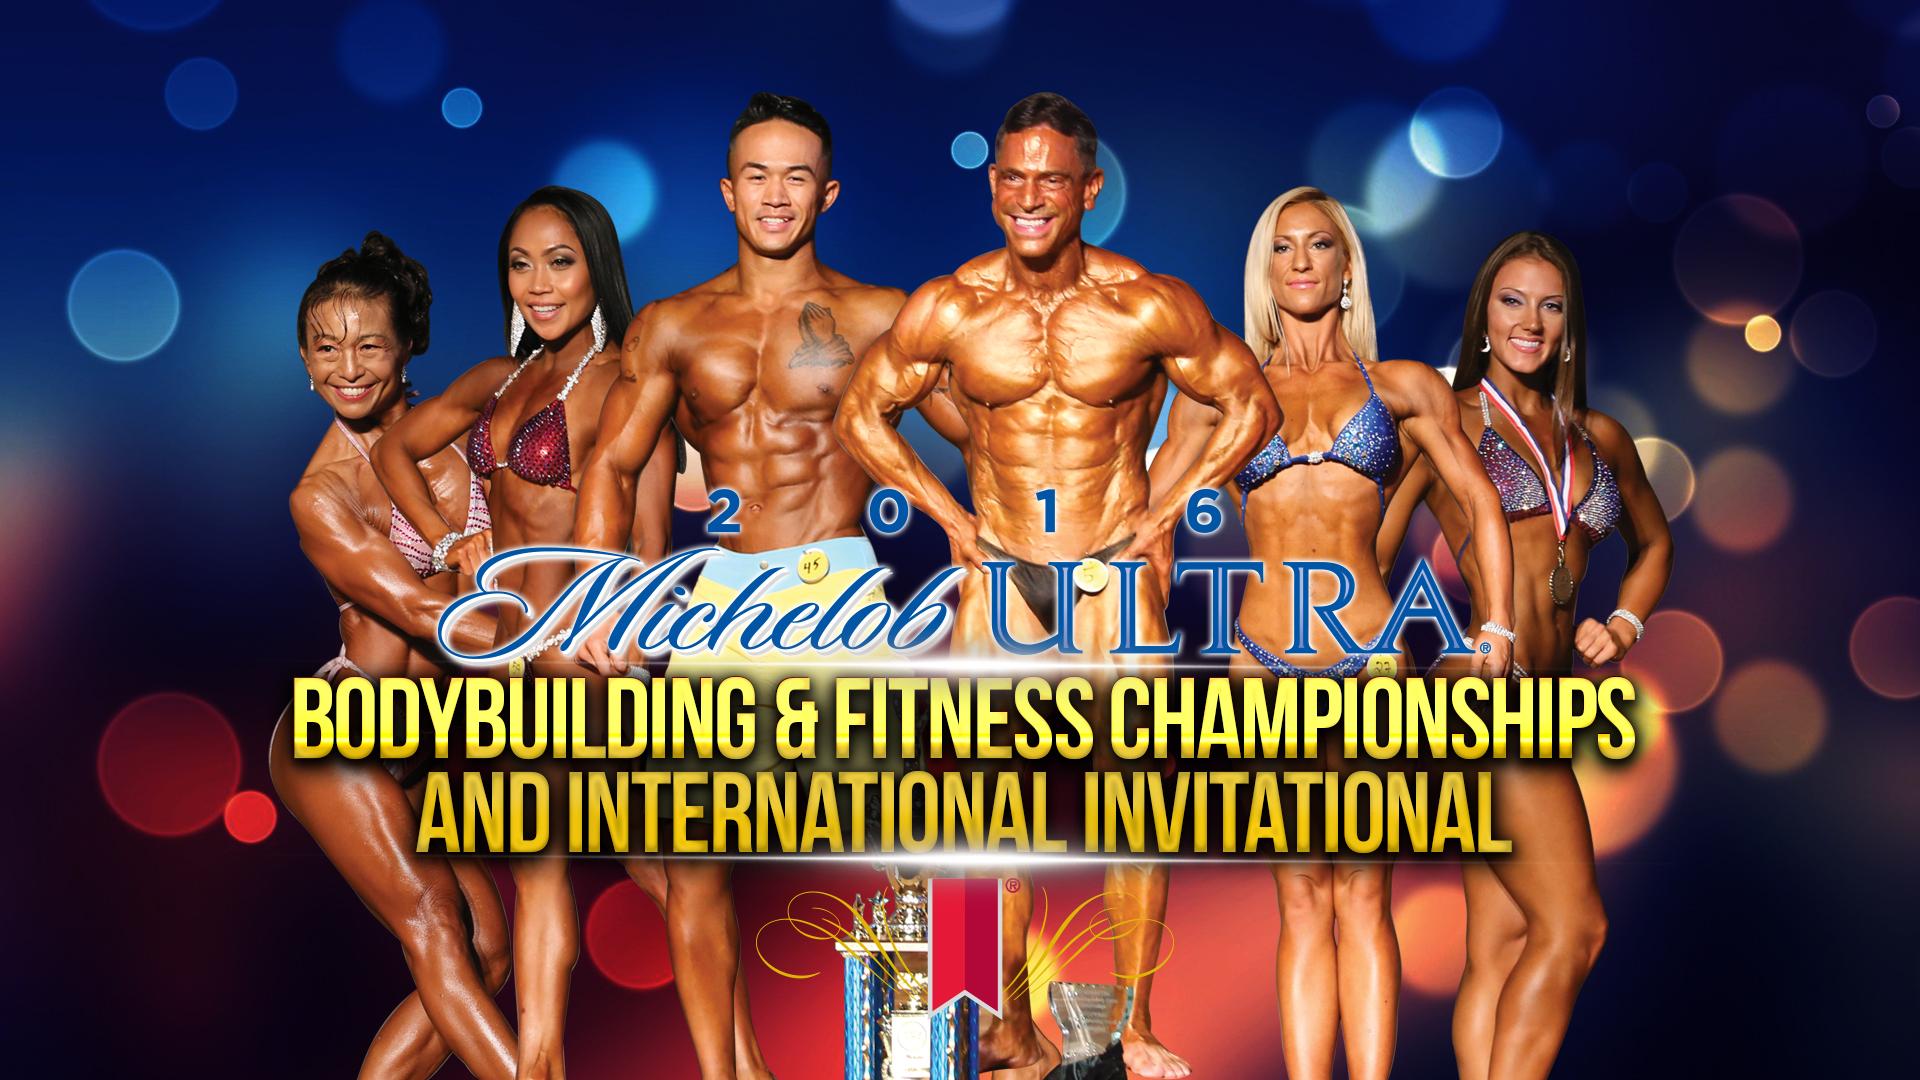 2016 Michelob Ultra Bodybuilding and Fitness International Invitational